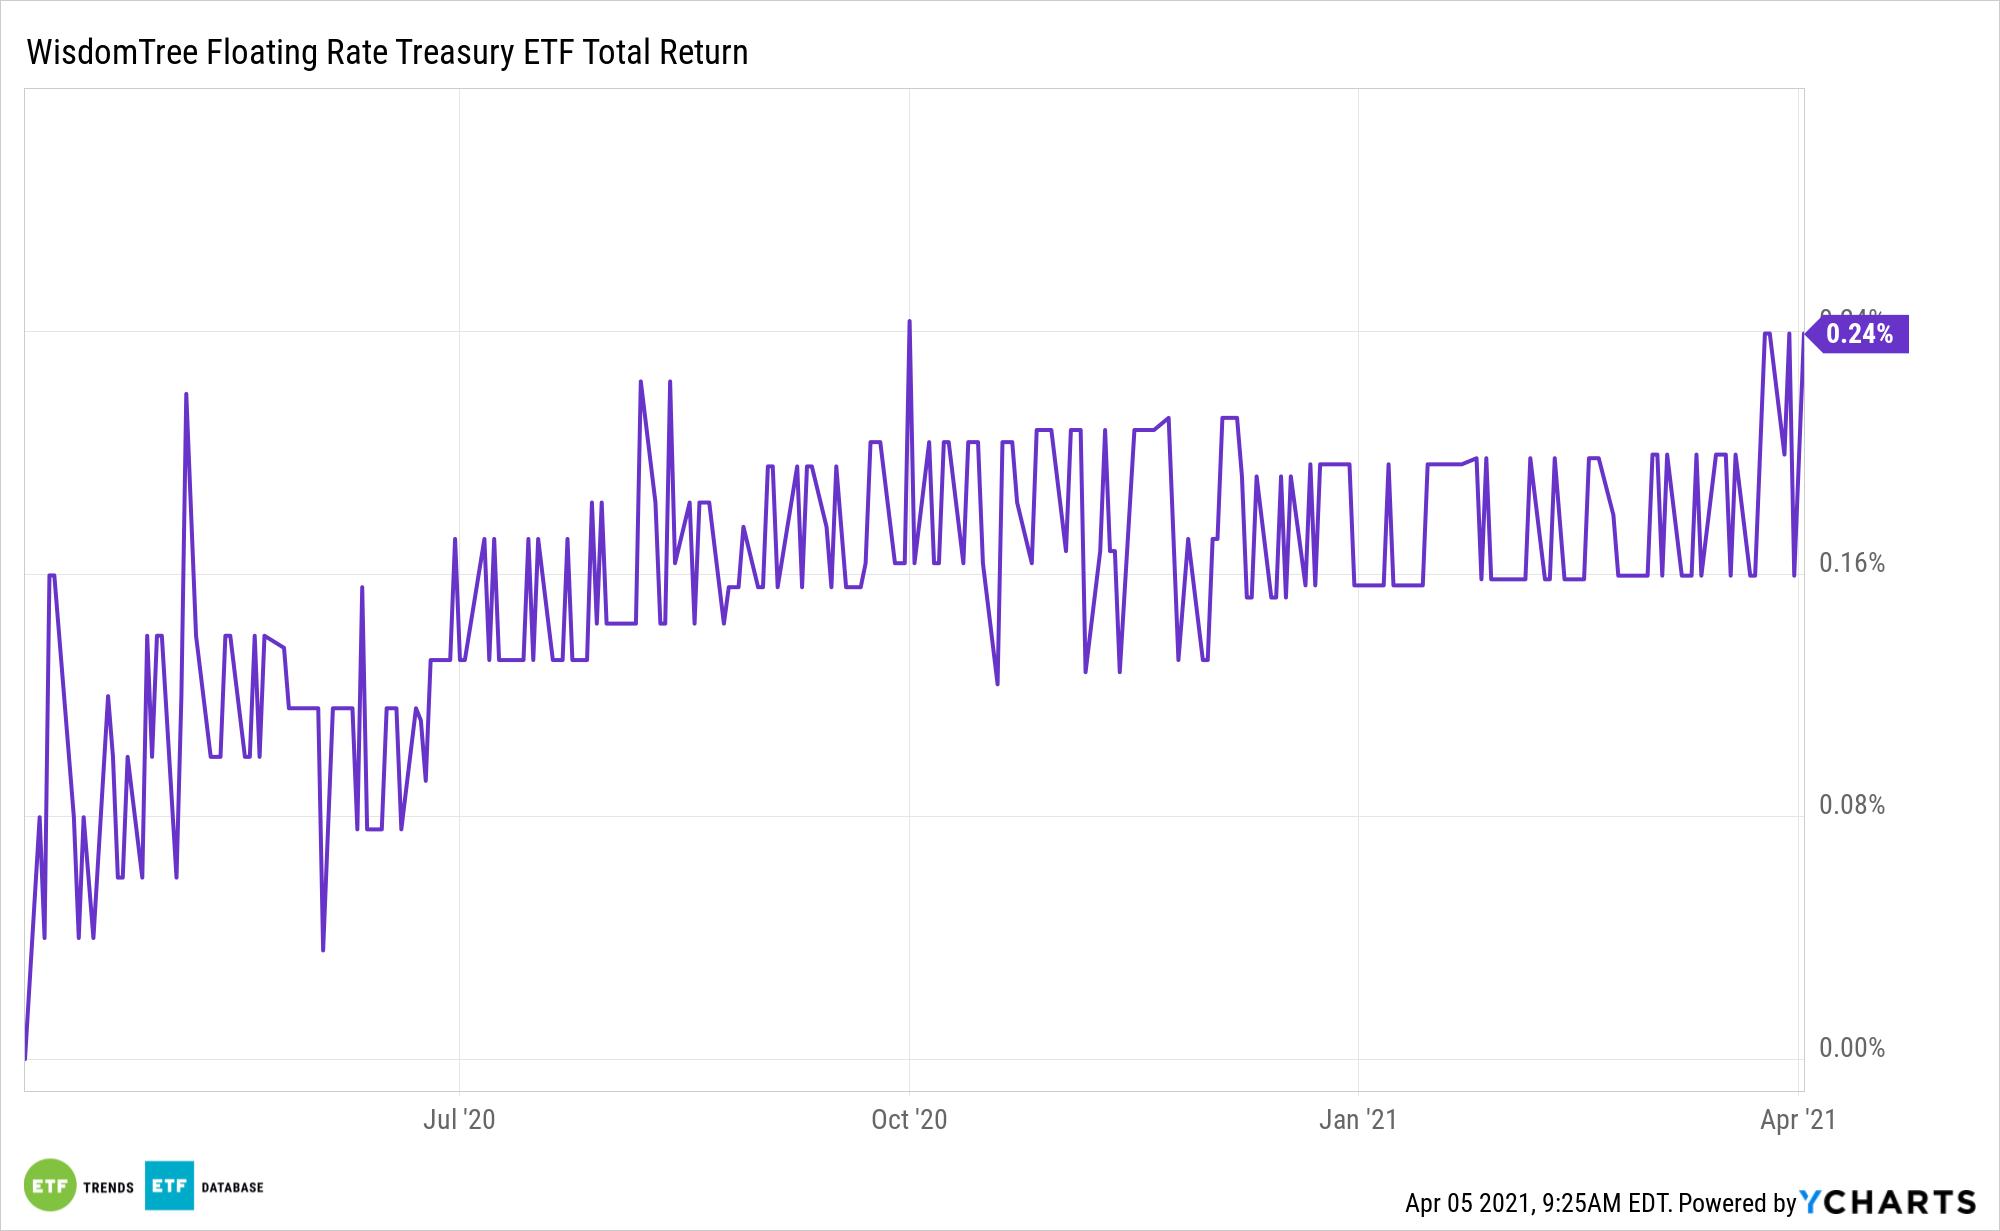 USFR 1 Year Total Return